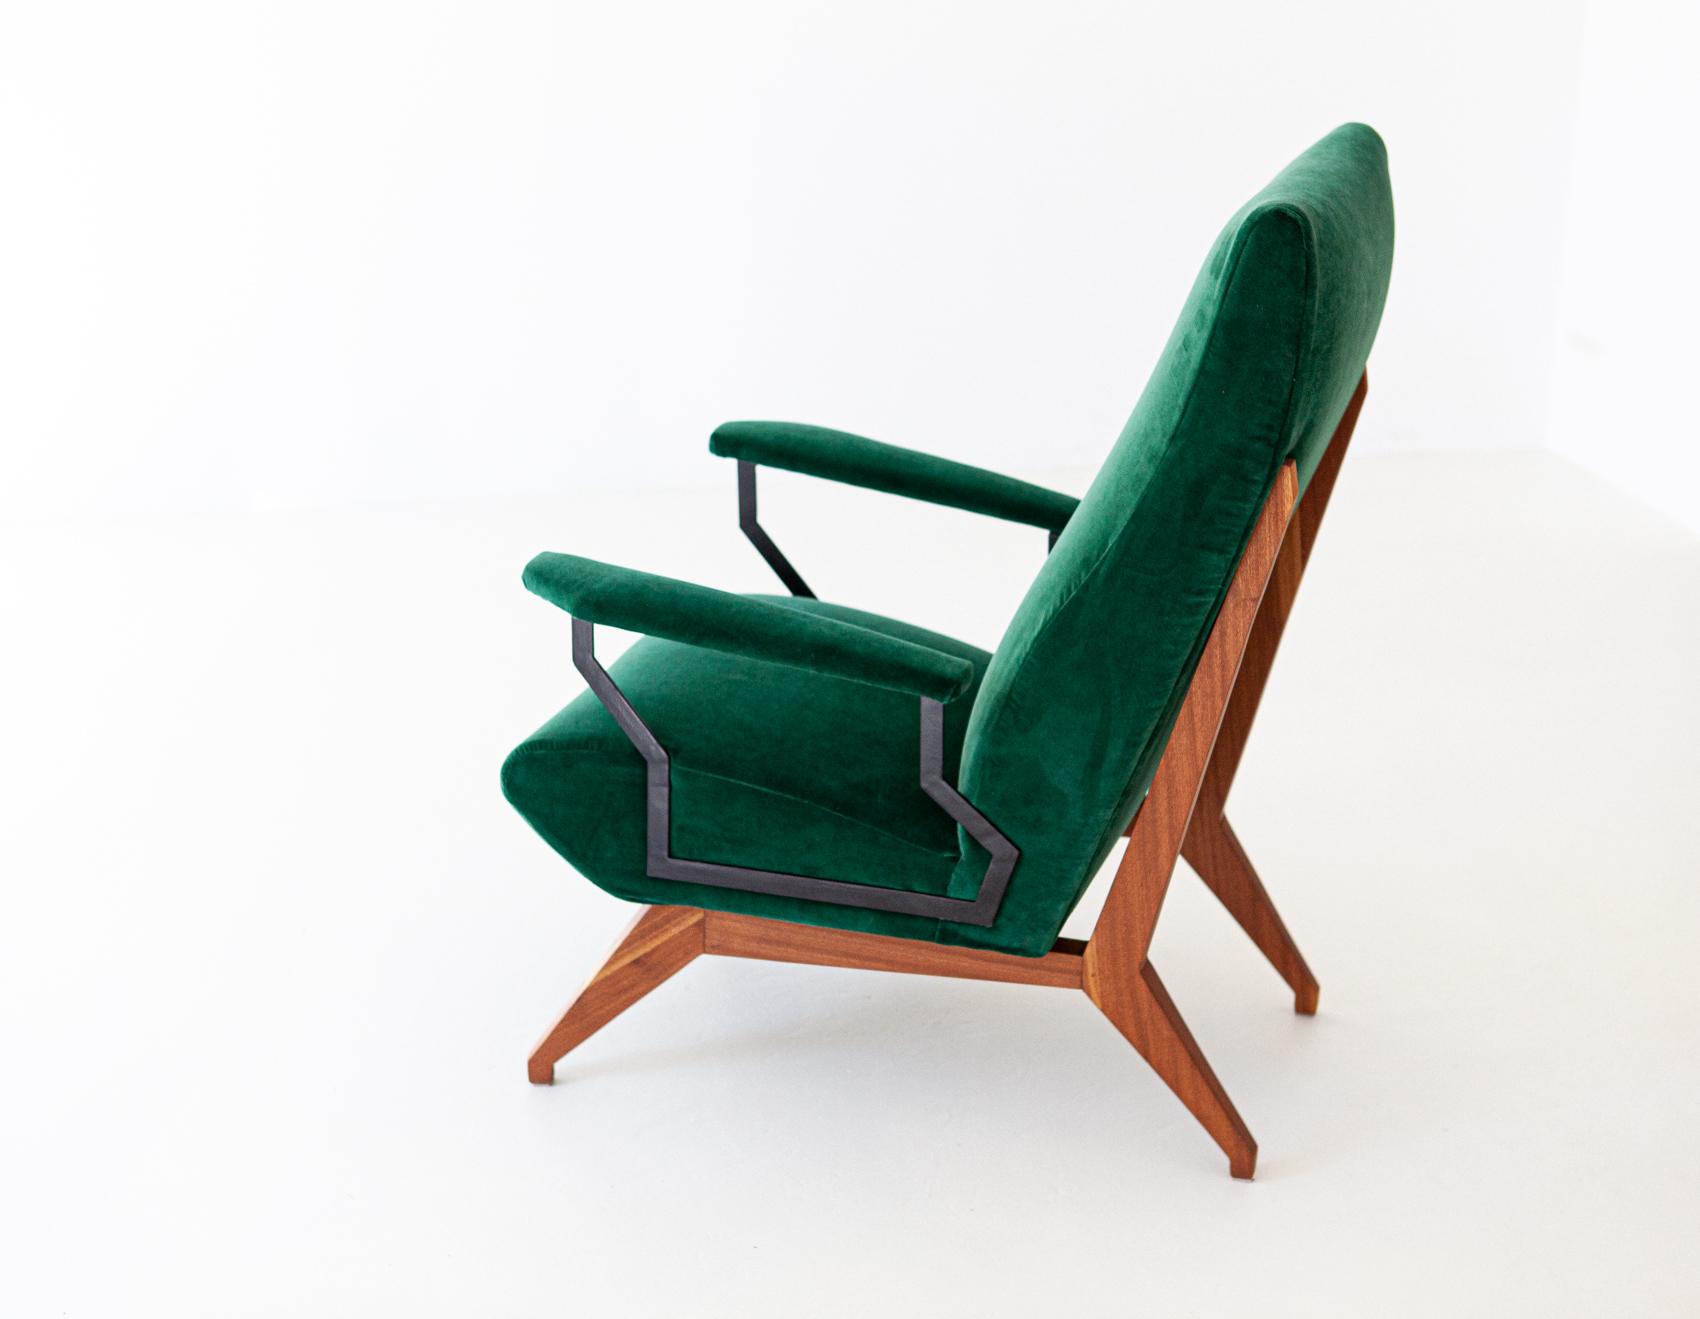 1950s-green-velvet-mahogany-italian-armchair-5-se290